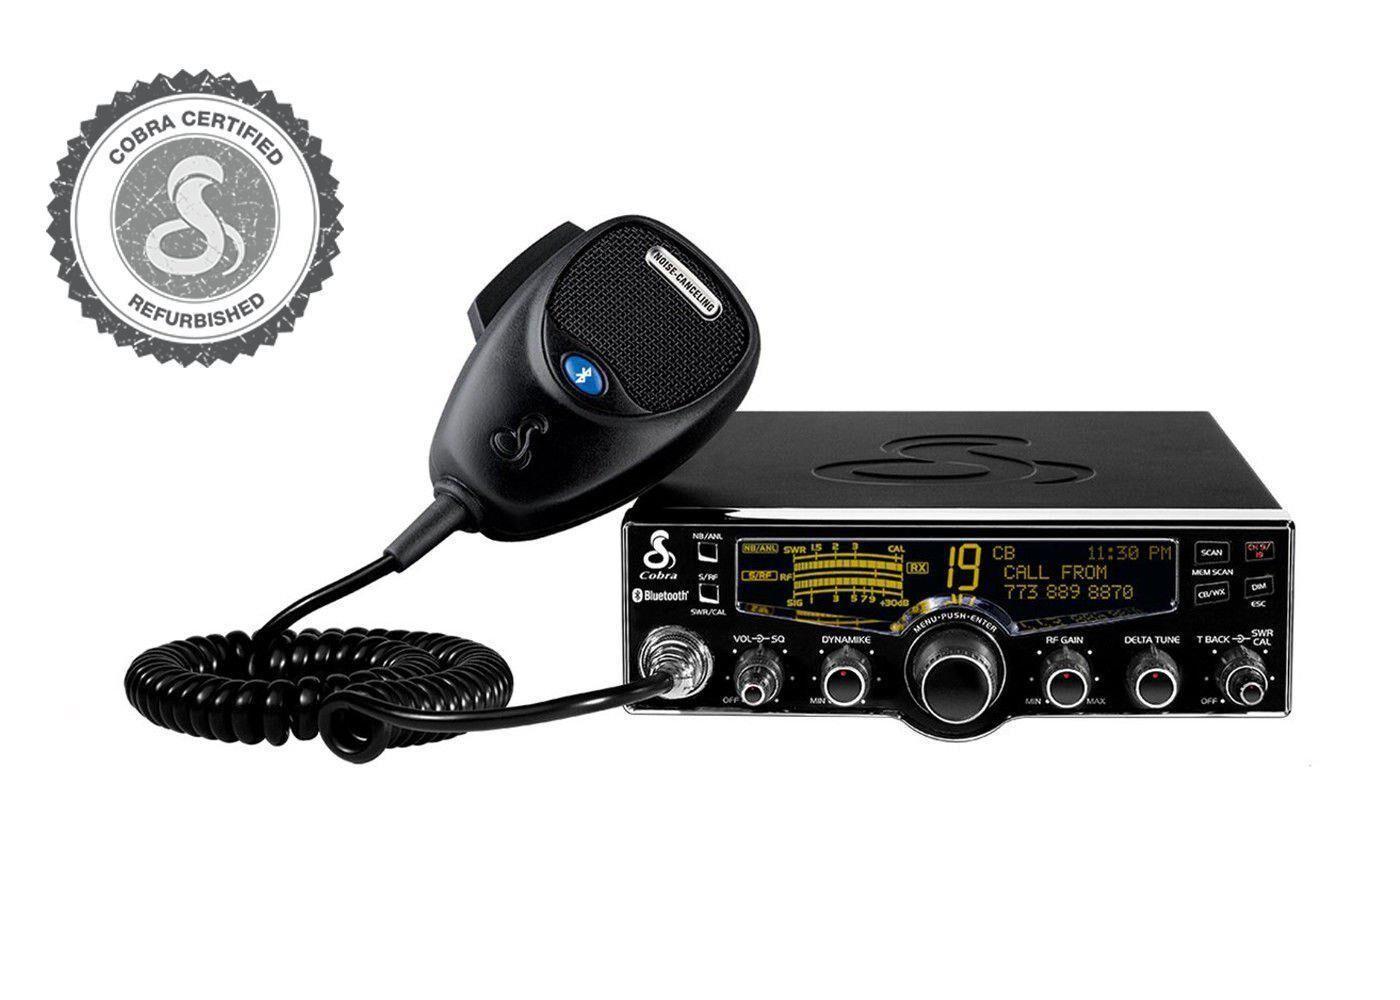 Cobra 29 LX BT (Refurb) Professional CB Radio Bluetooth Enabled